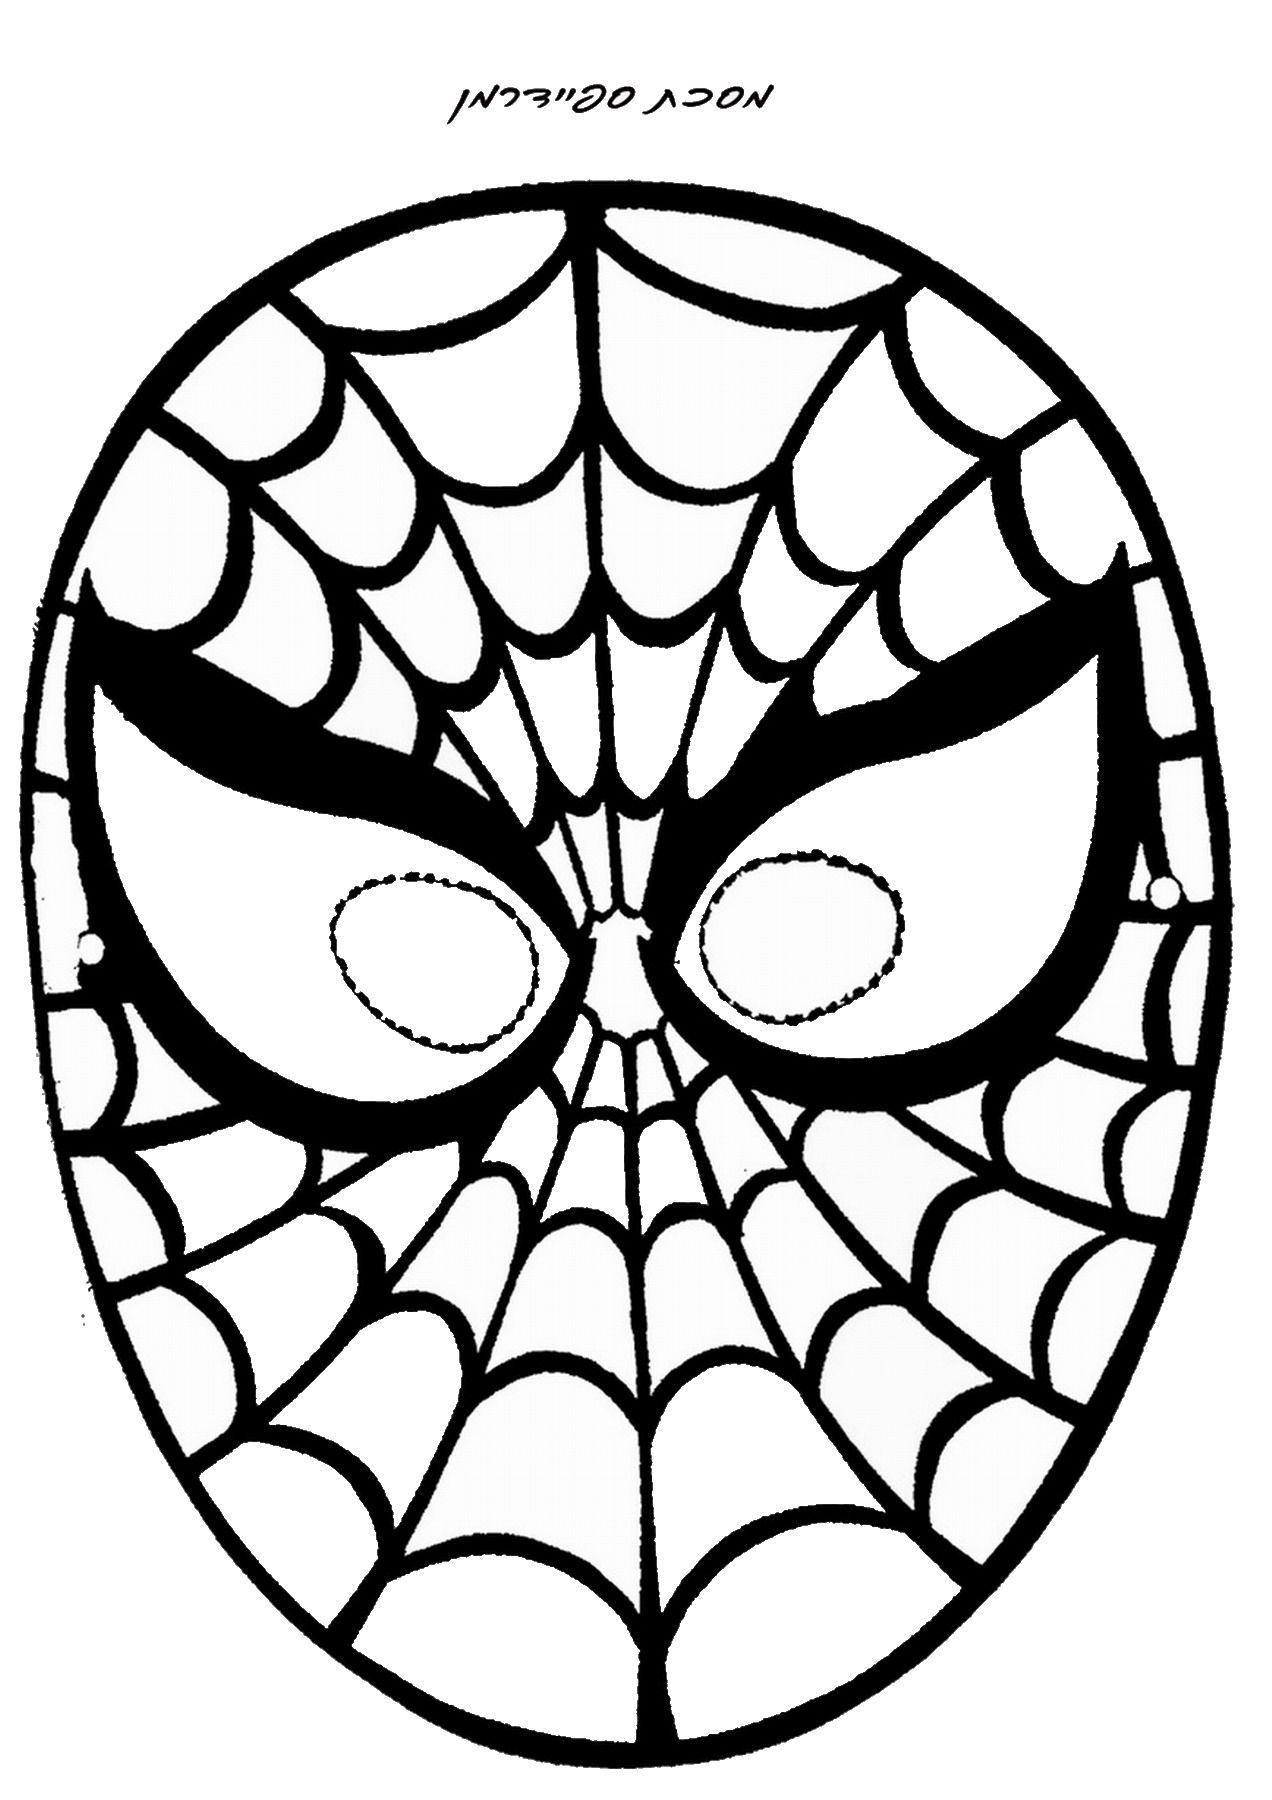 דף צביעה מסכת ספיידרמן 2 Spiderman Mask Spiderman Coloring Coloring Pages